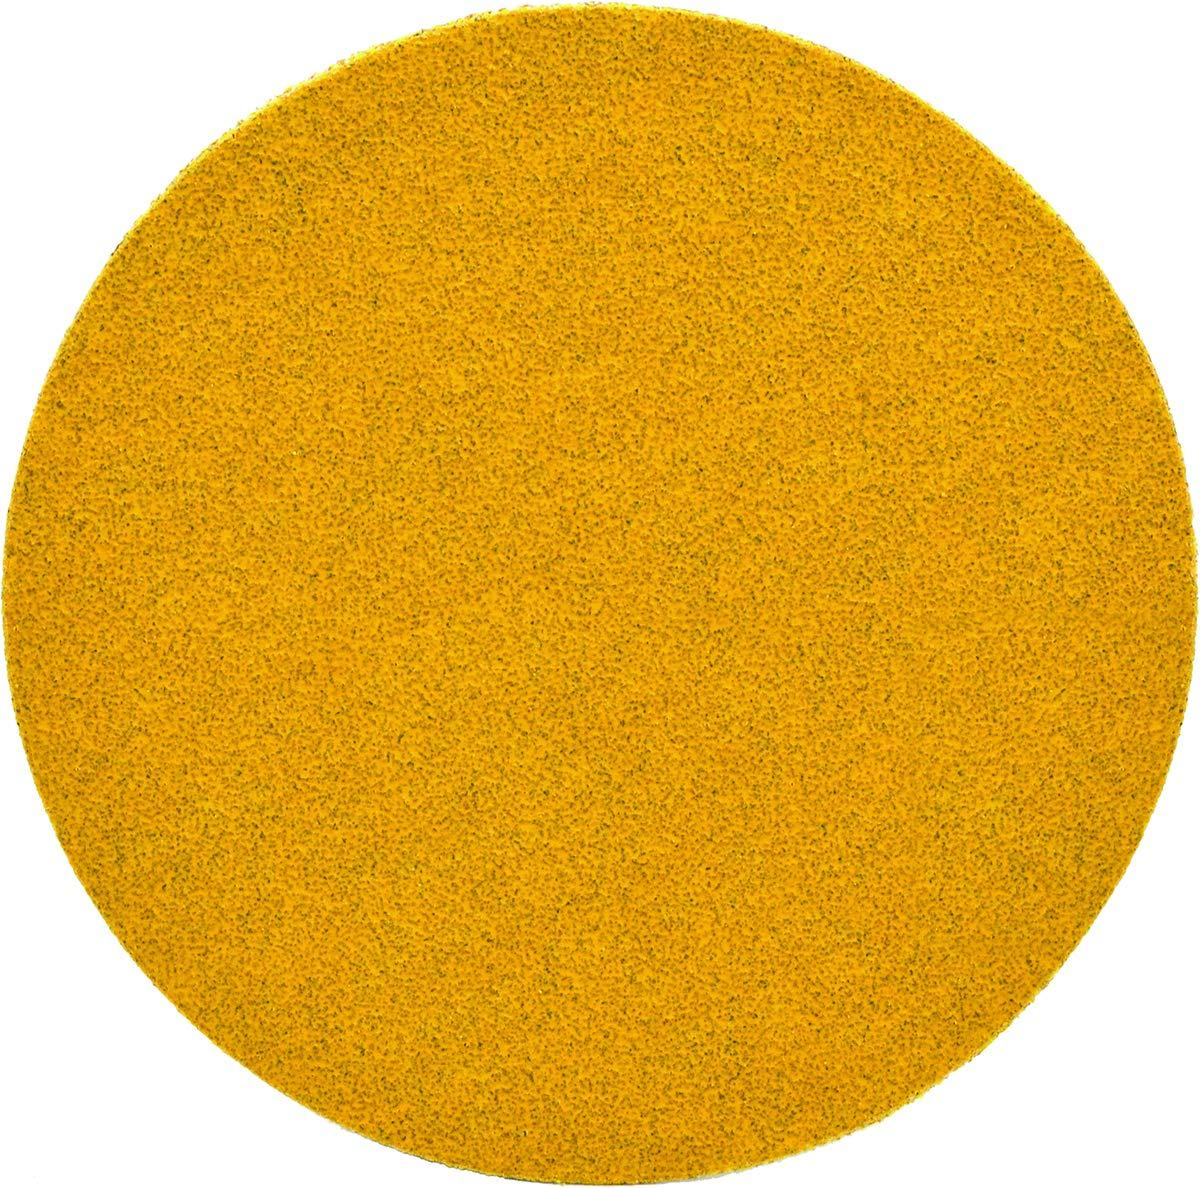 Superior Abrasives 39981 SHUR-KUT 5in Aluminum Oxide Gold Paper PSA Disc, 80 Grit (Pack of 100)